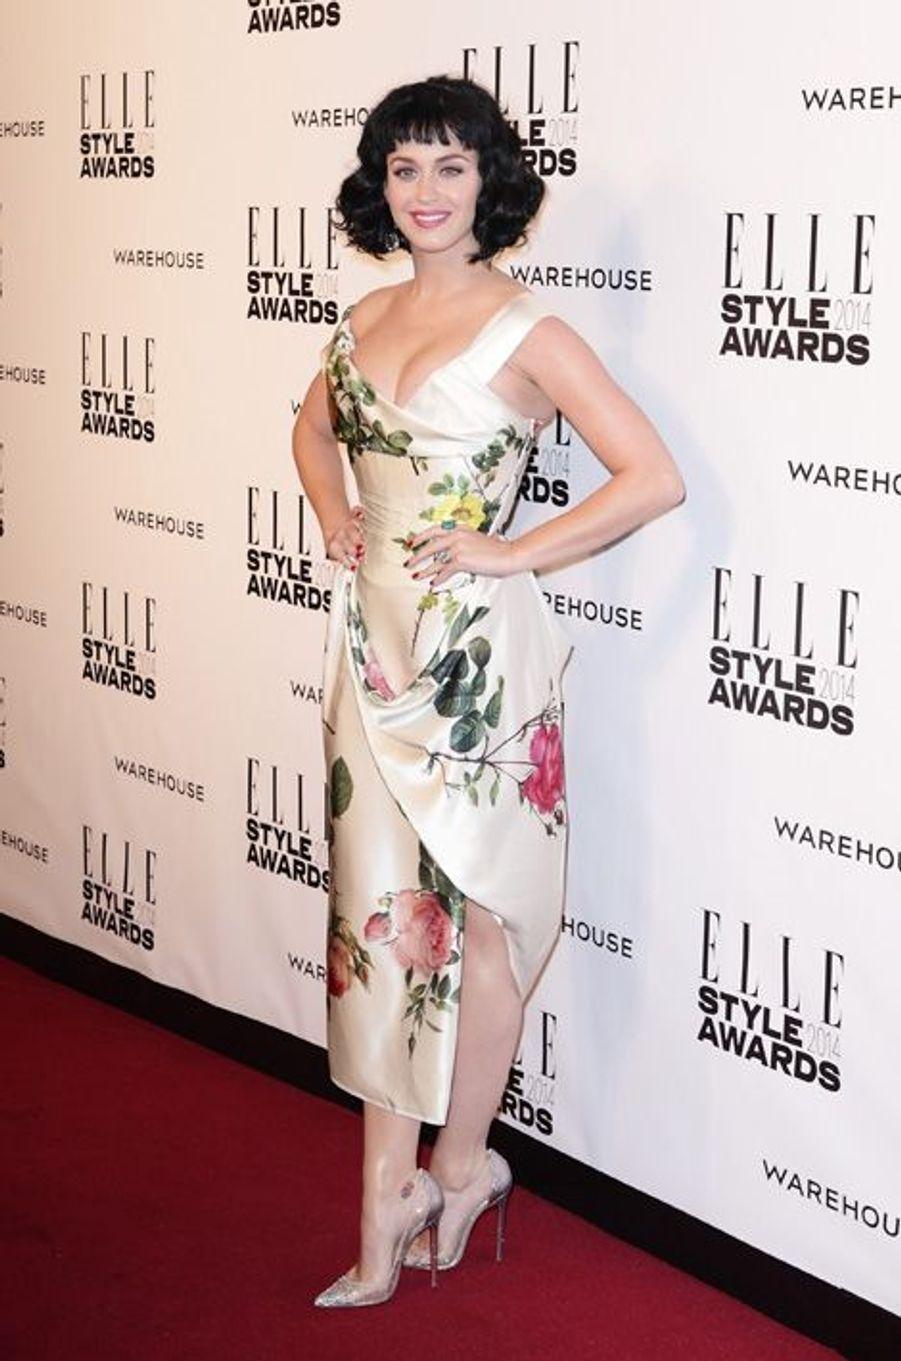 Katy Perry, reine de la soirée